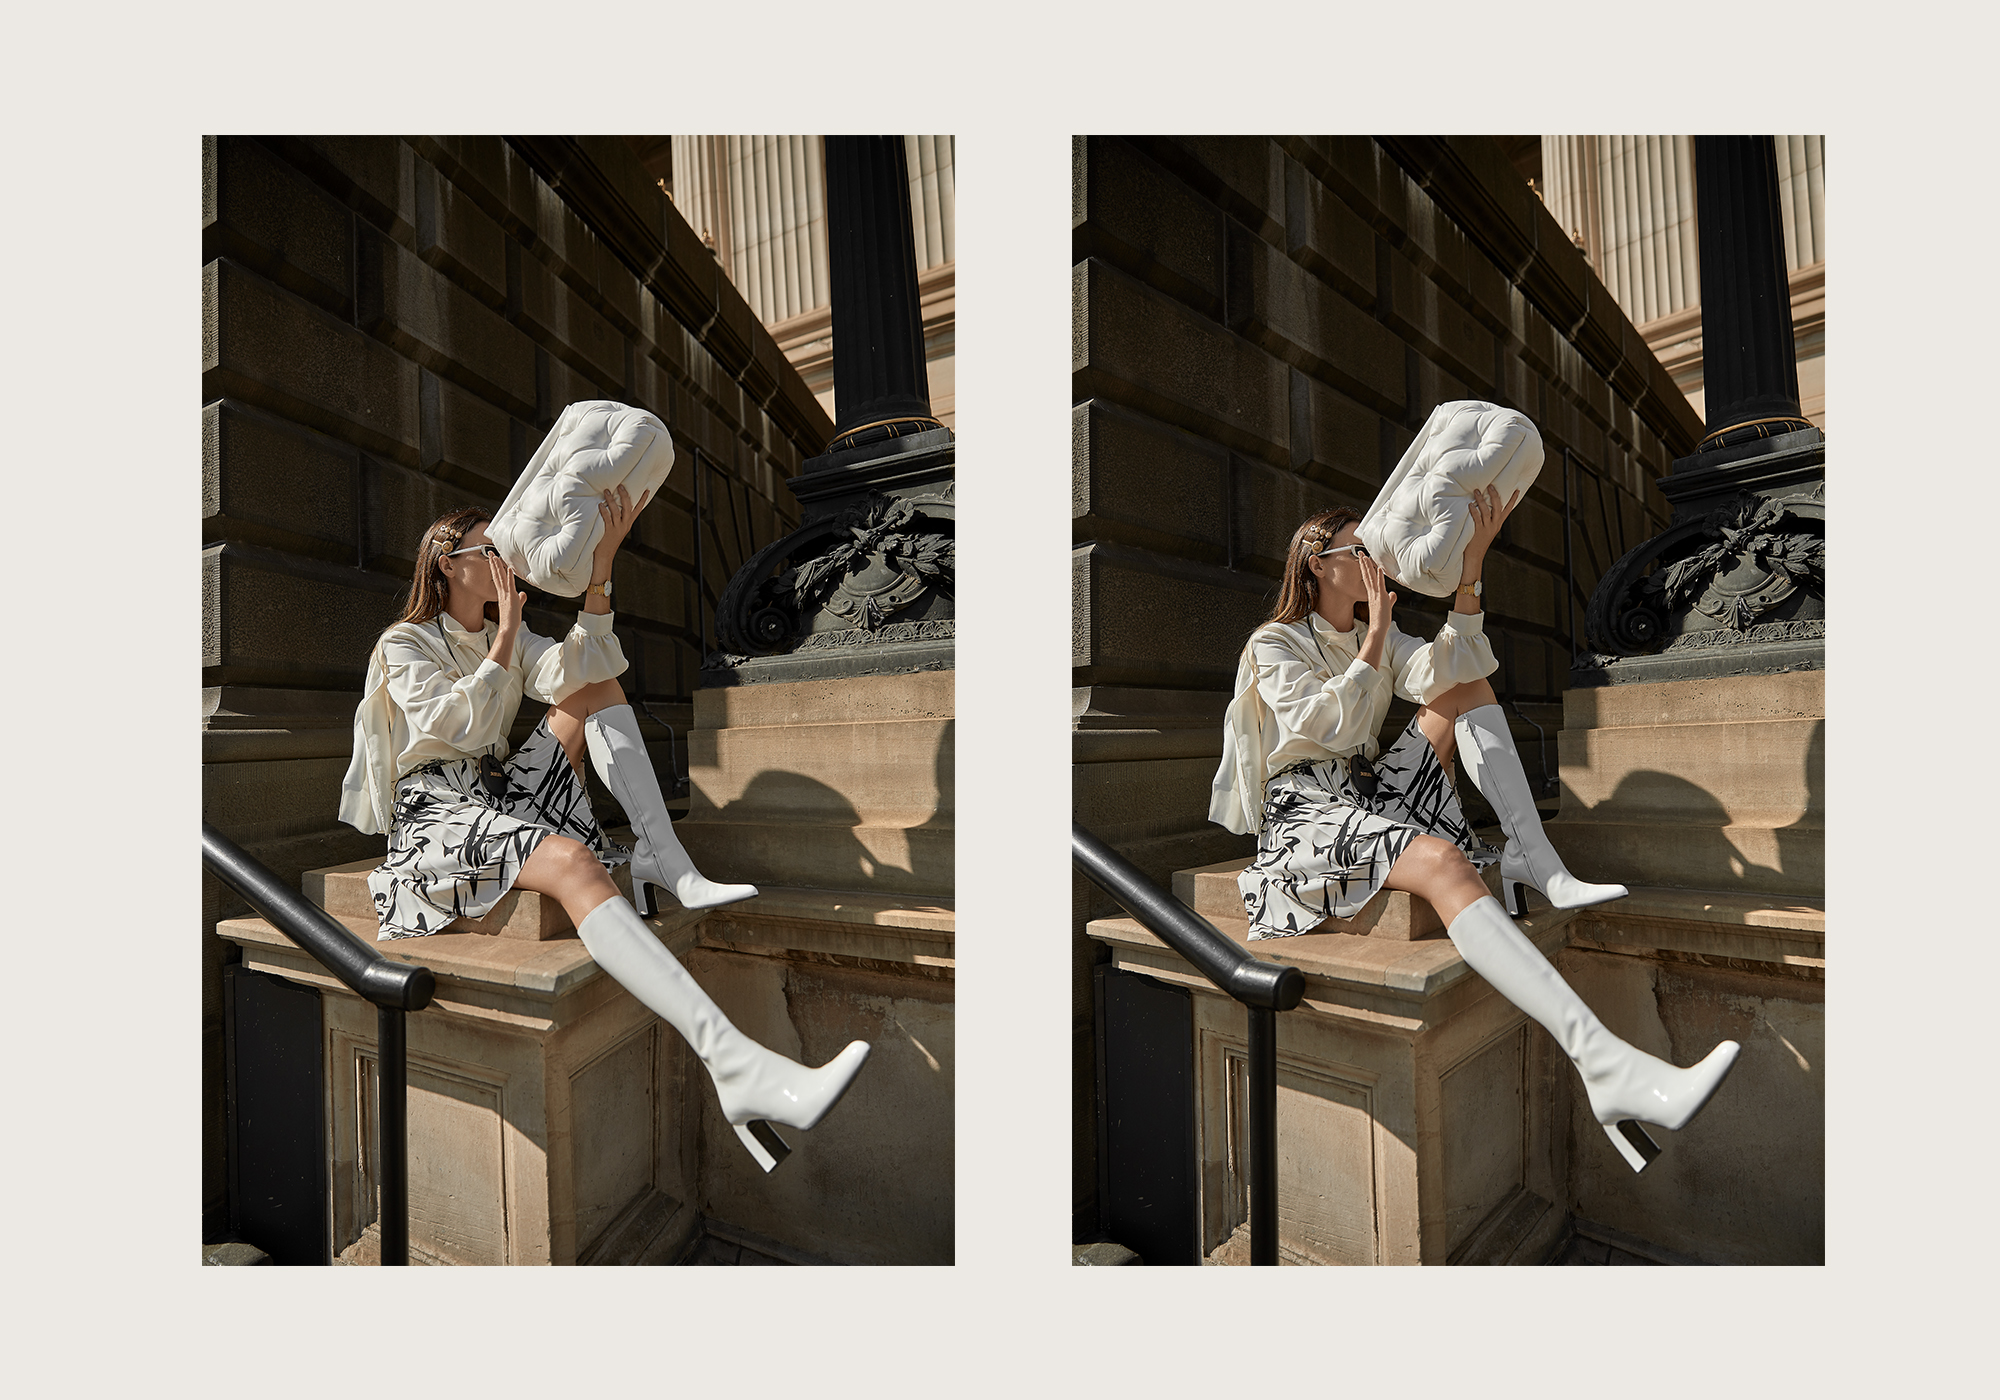 Balenciaga, Boots, Margiela, Bag, Jacquemus Bag, Oracle, Fox, Outfit